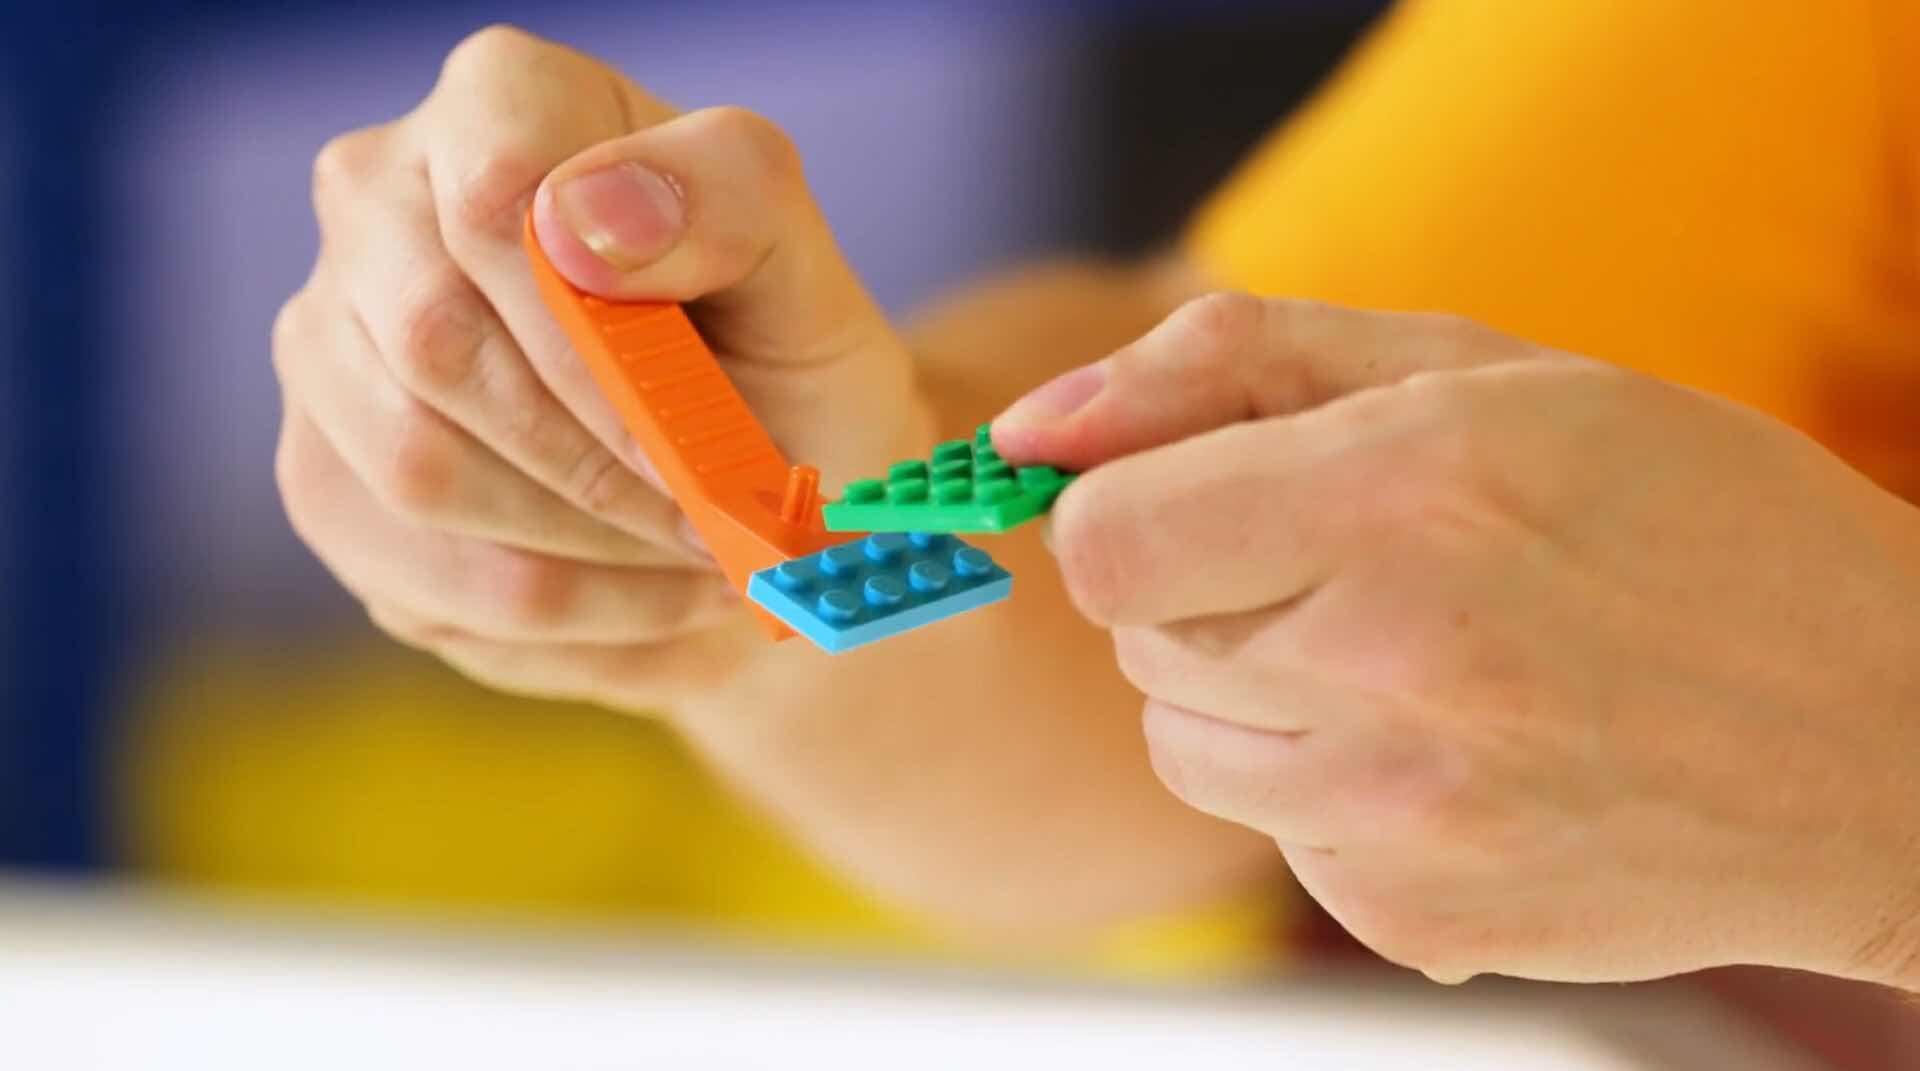 lego-brick-separator-tool